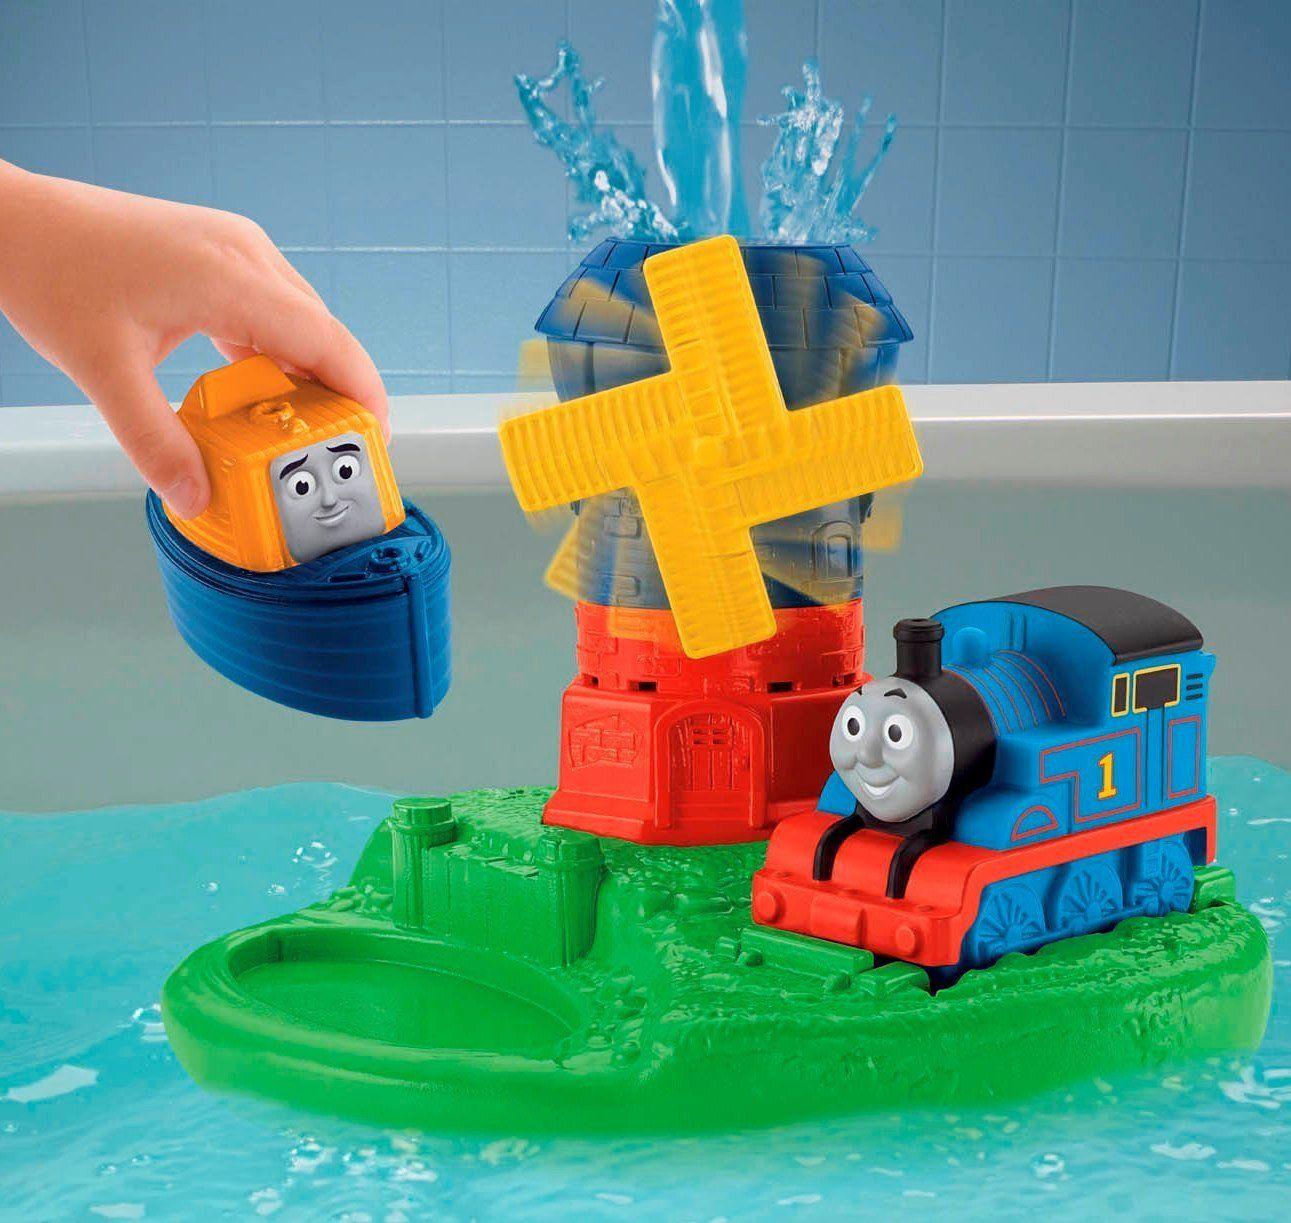 Thomas the Train Island of Sodor Bath Playset | Gabe | Pinterest ...